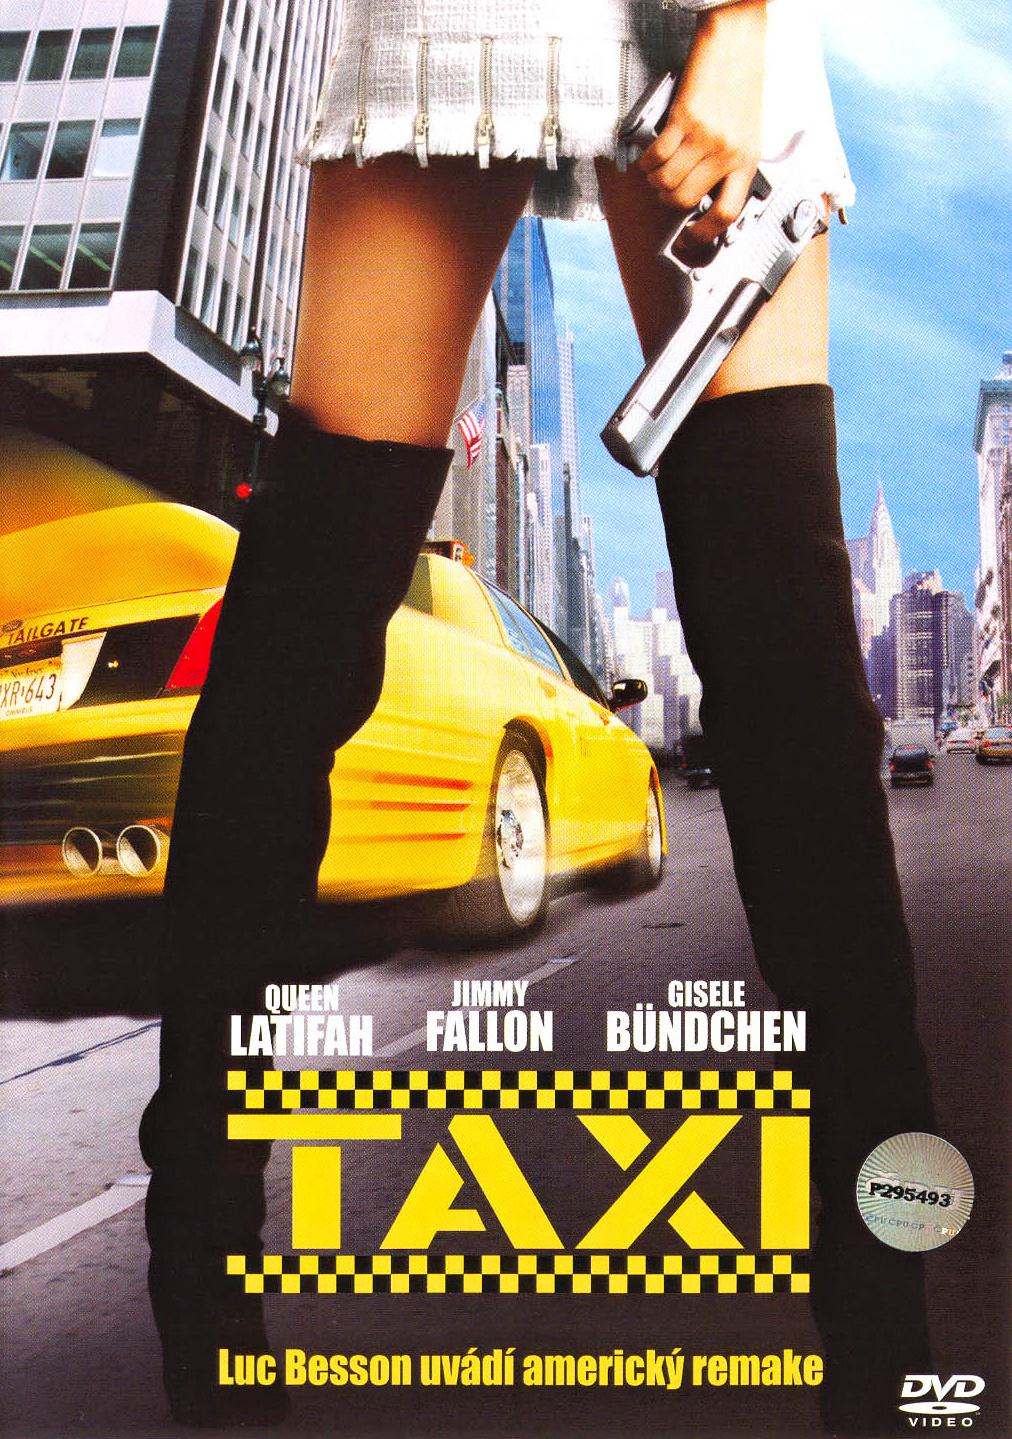 Spustit online film zdarma Taxi